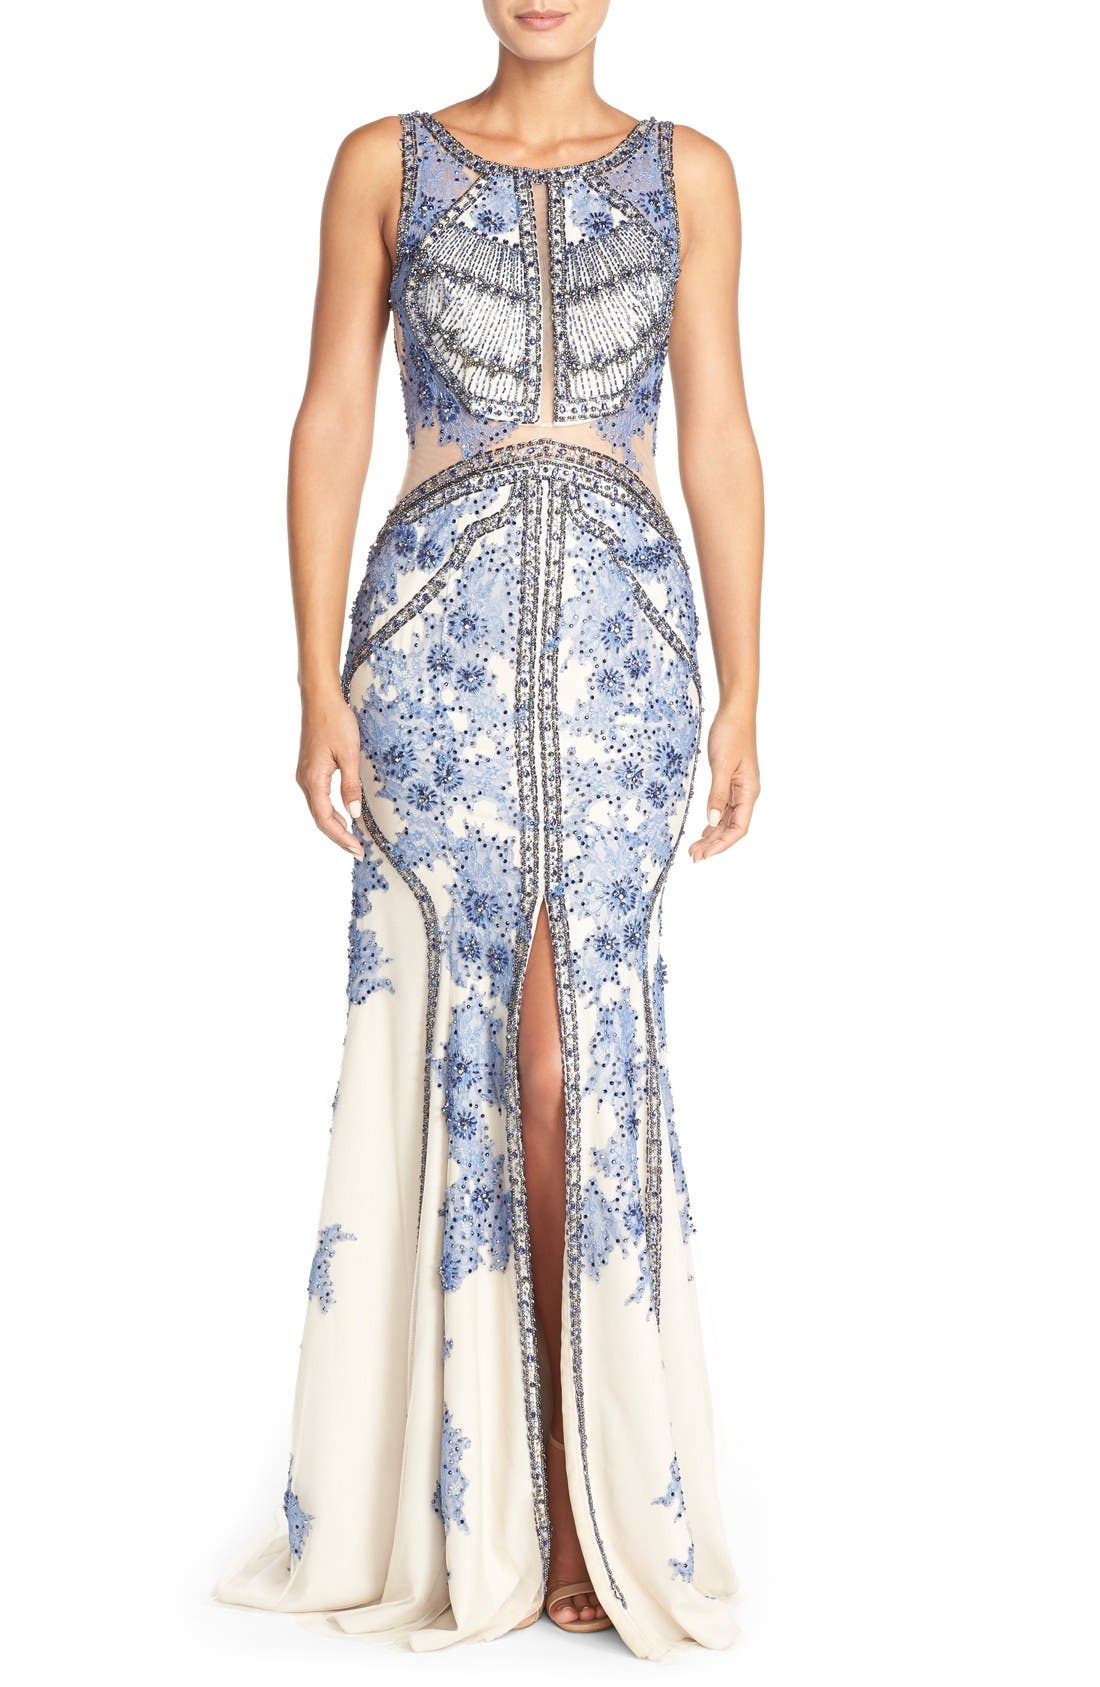 Main Image - TeraniCouture Embellished Sleeveless Gown